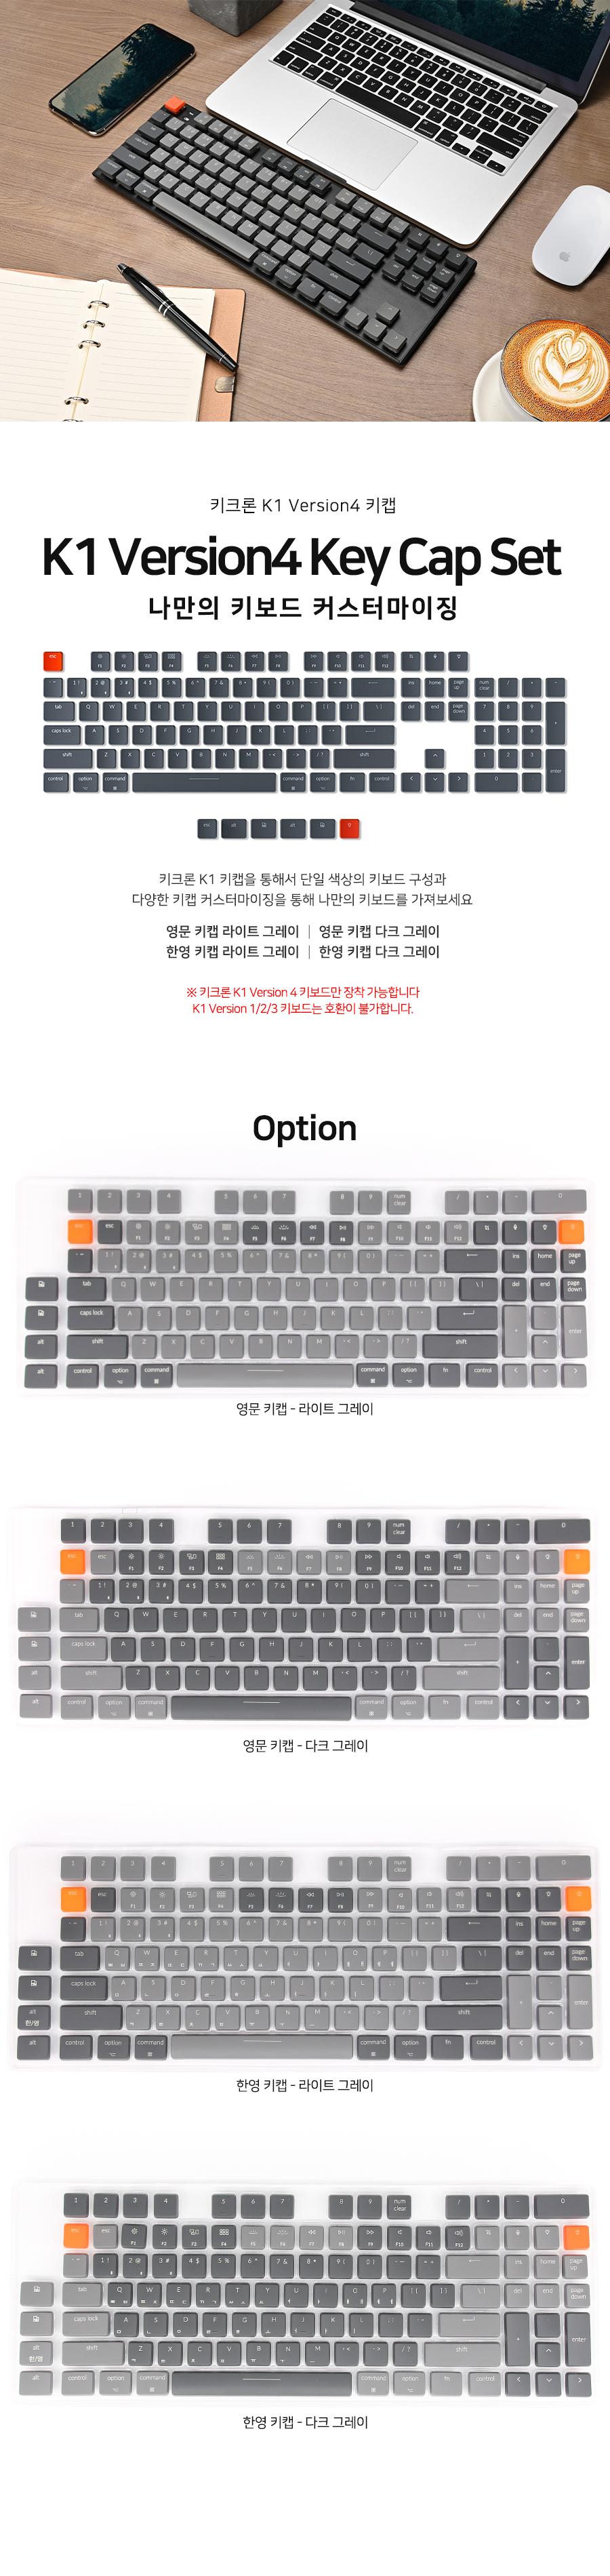 Keychron K1 V4용 키캡 영문 (다크 그레이)